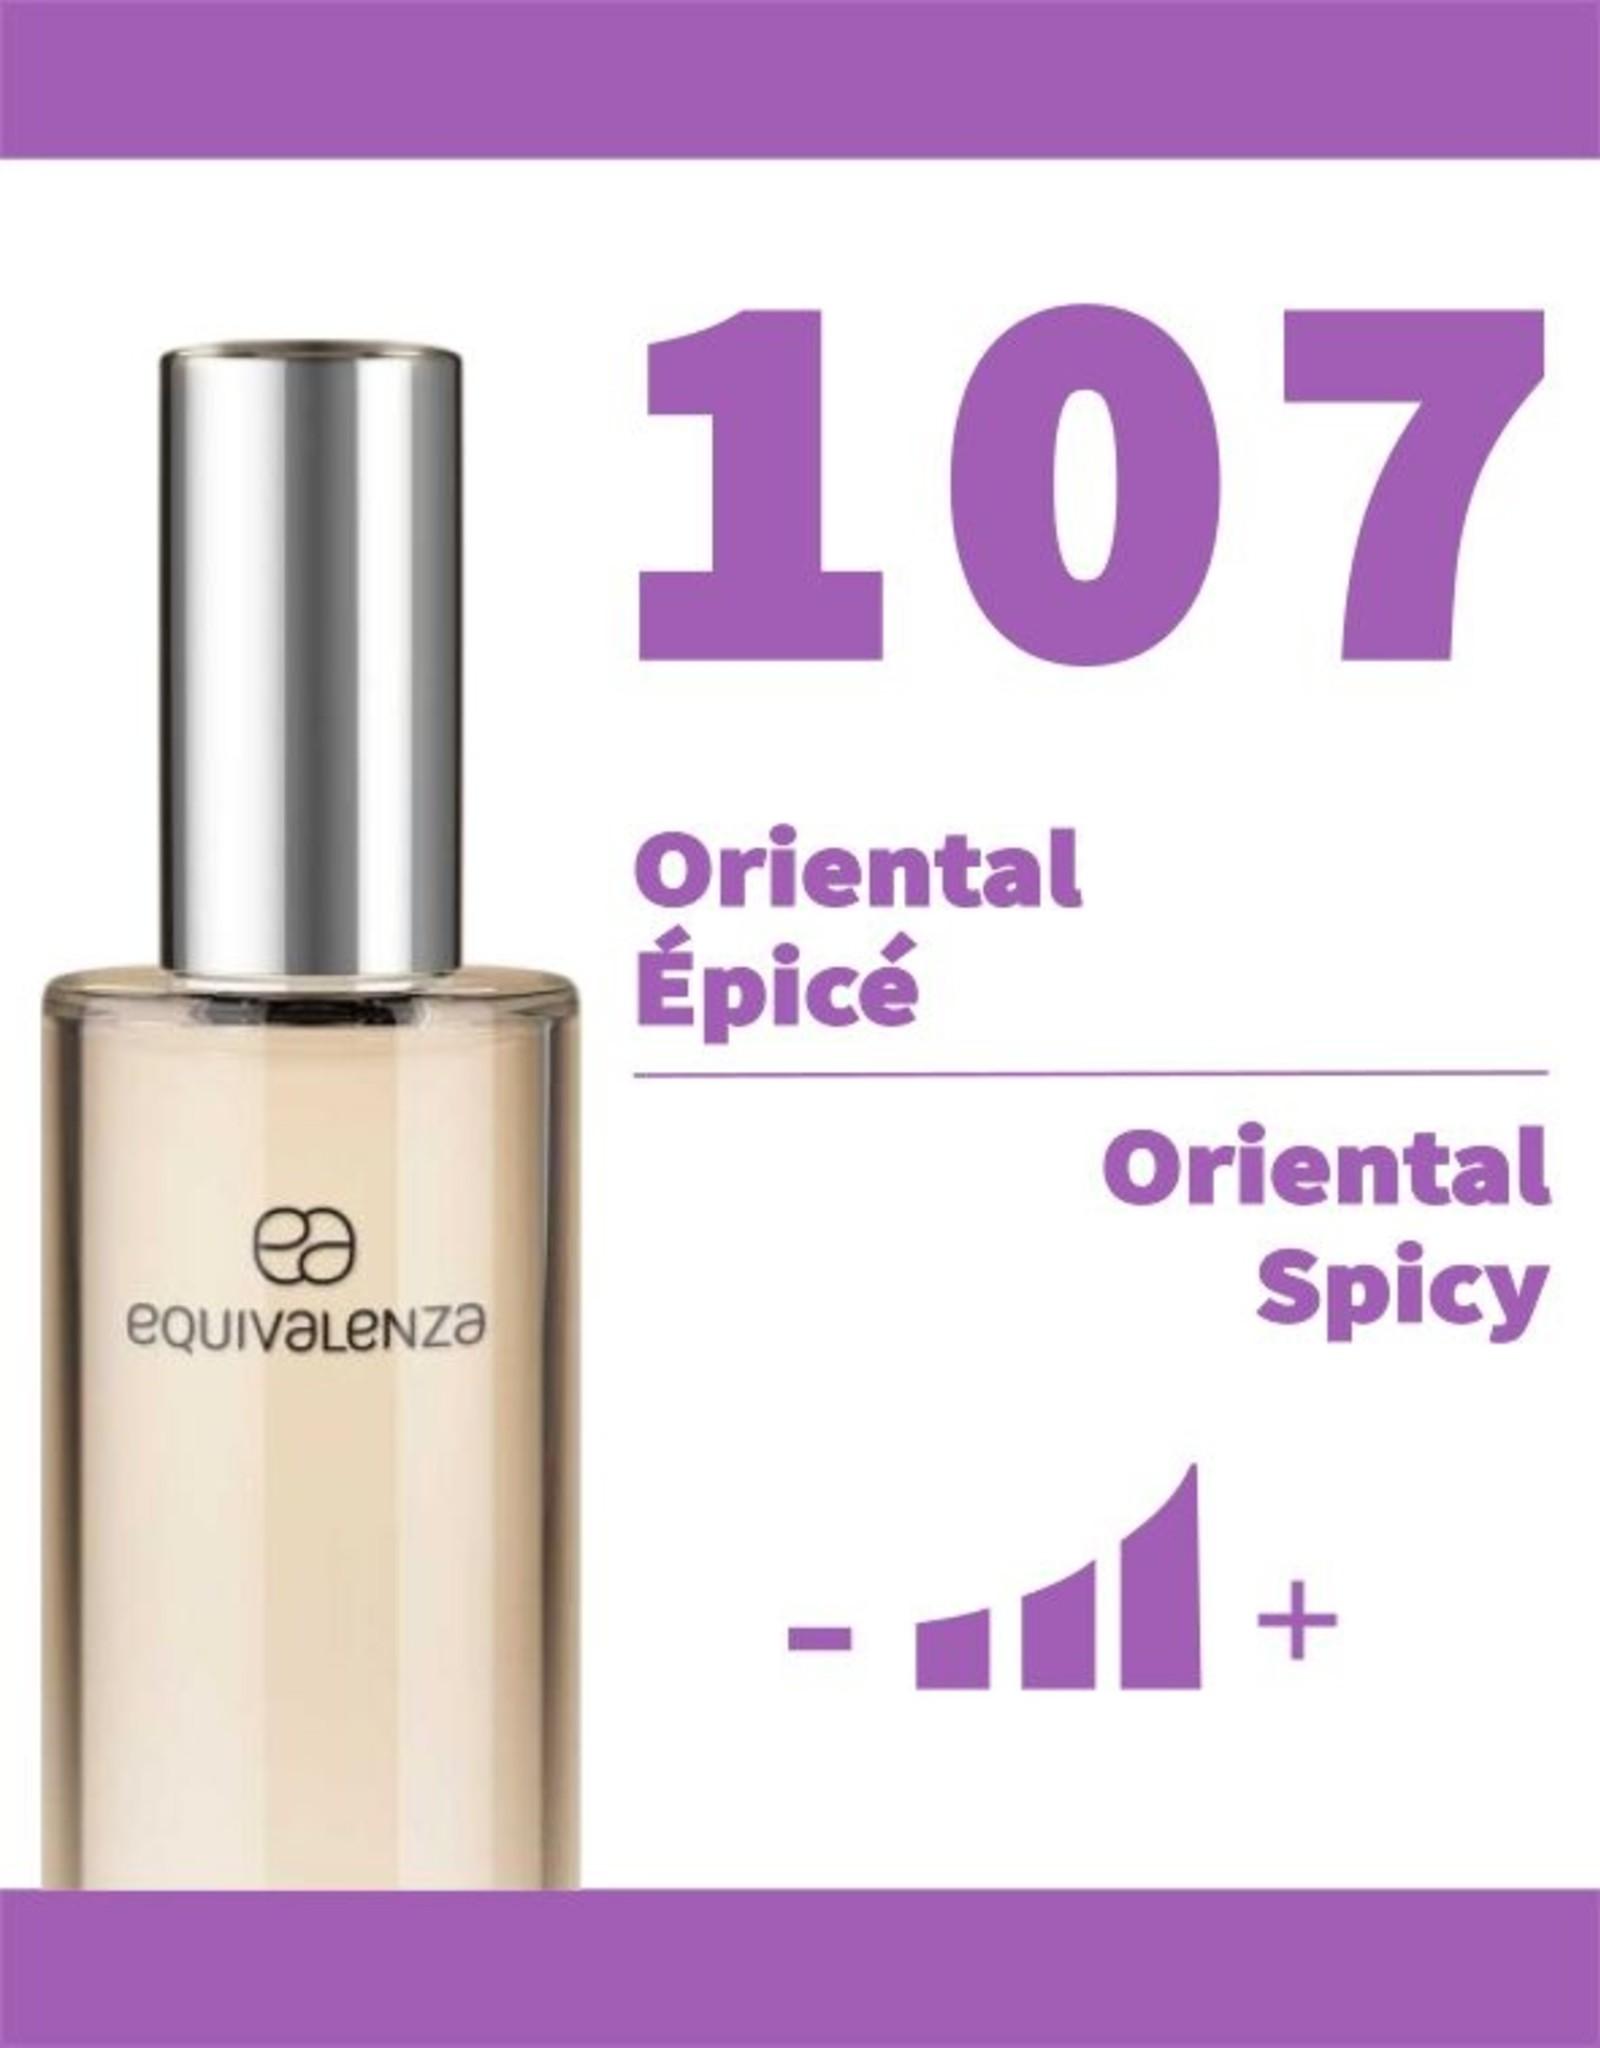 Equivalenza Oriental Spicy107